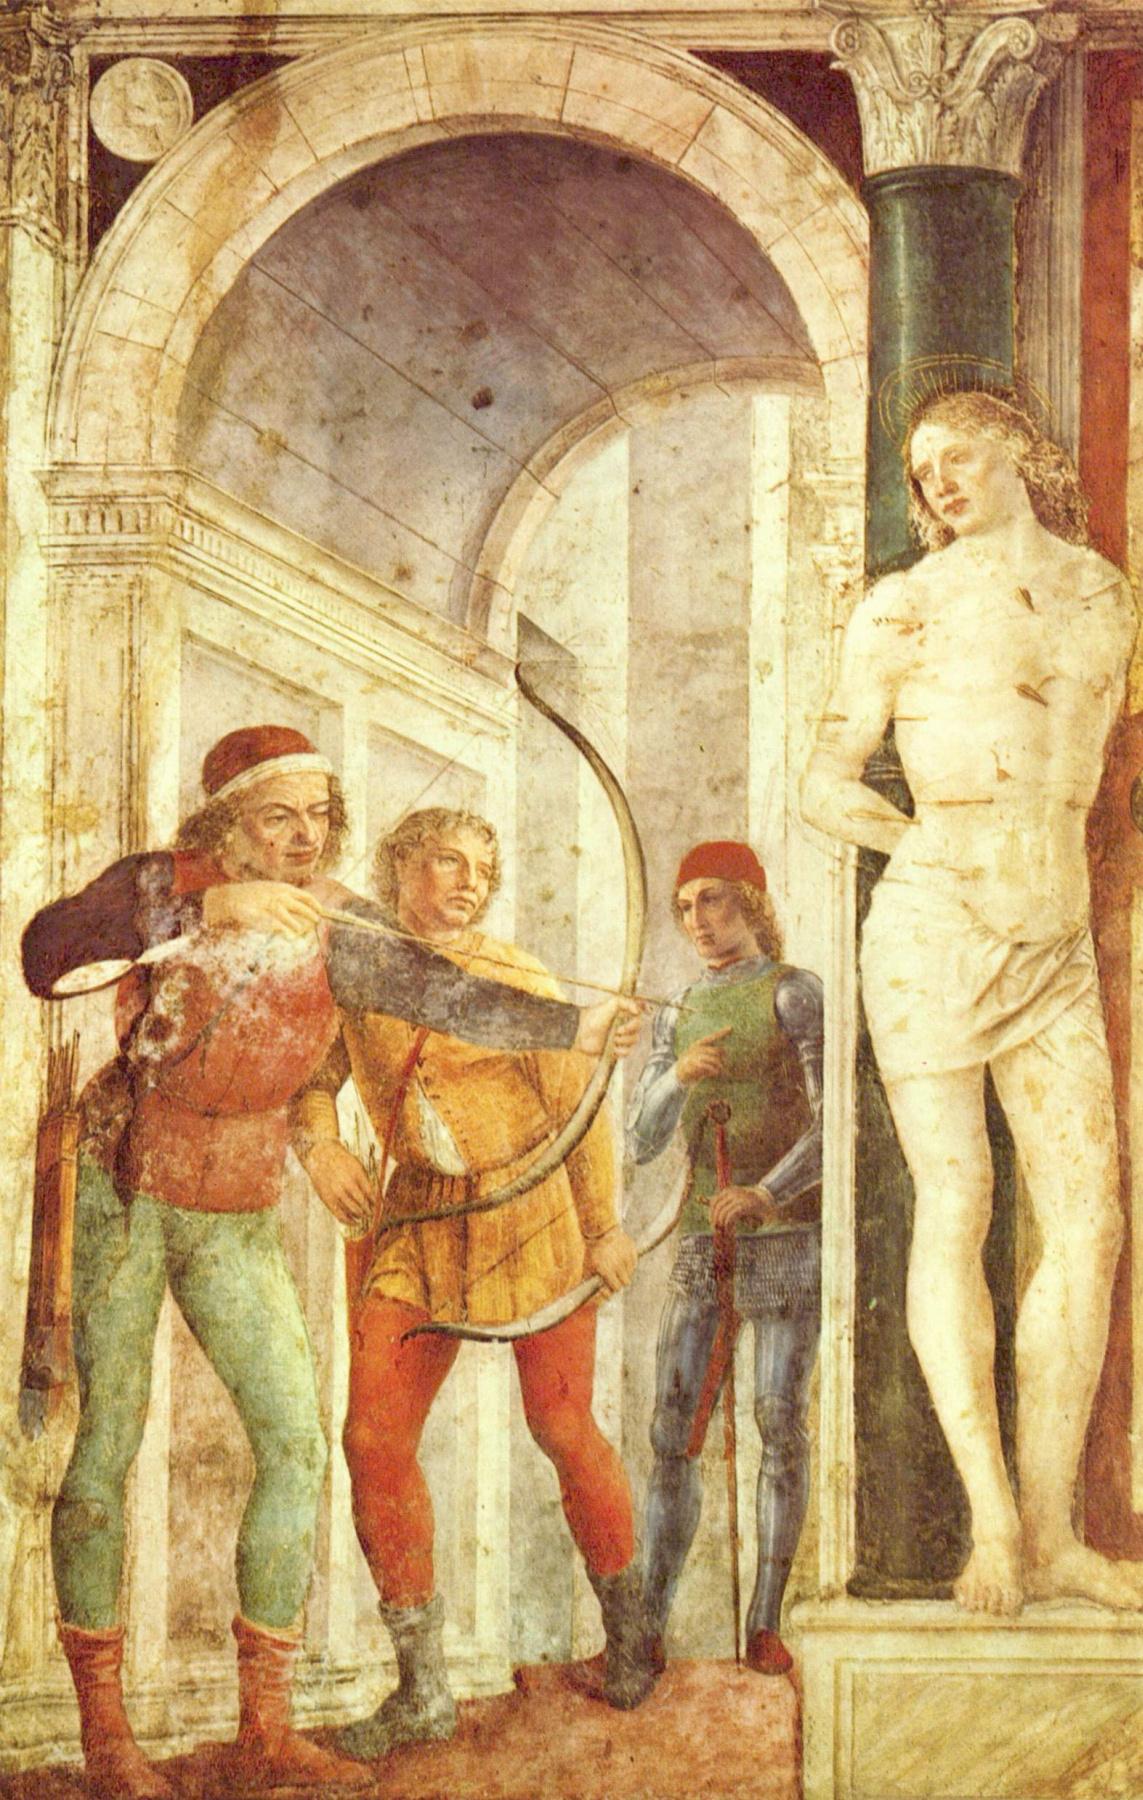 Vincenzo Foppa. The martyrdom of St. Sebastian